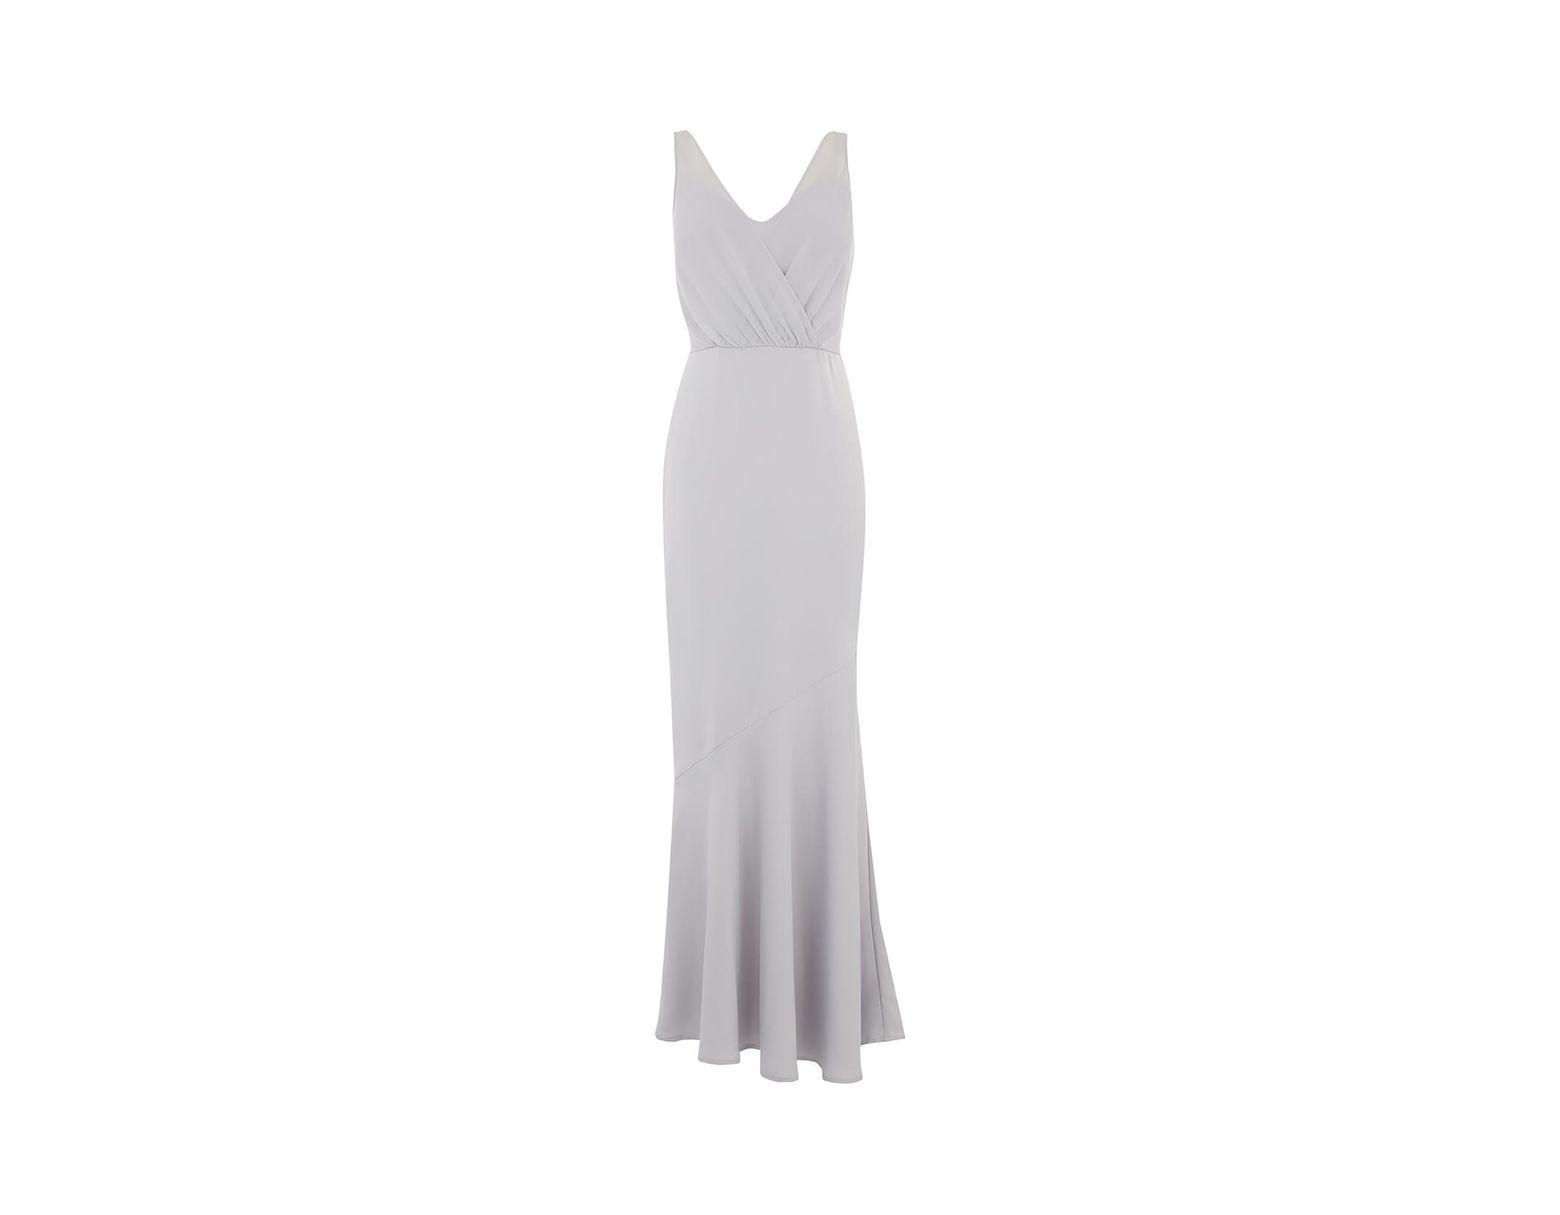 5f34f7658e6 Oasis Slinky Wrap Over Slinky Maxi Dress in Gray - Lyst